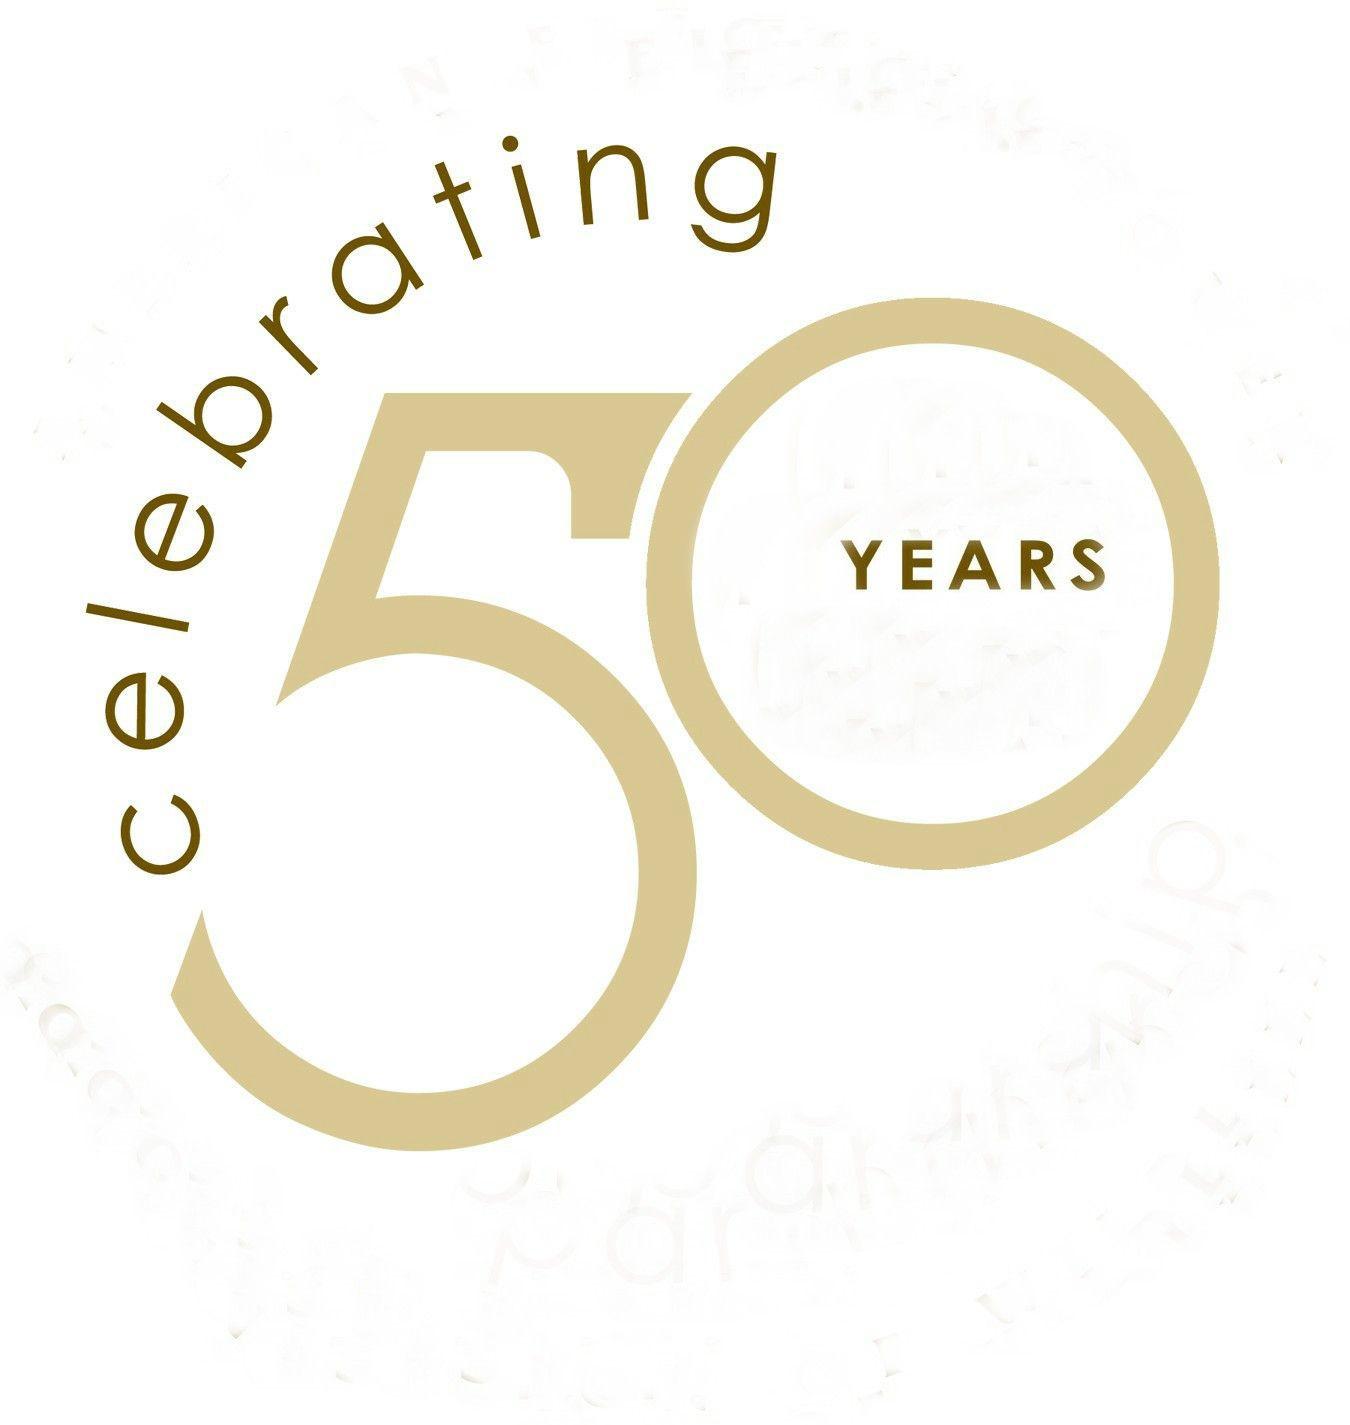 Anniversary clipart 50 year, Picture #45545 anniversary.